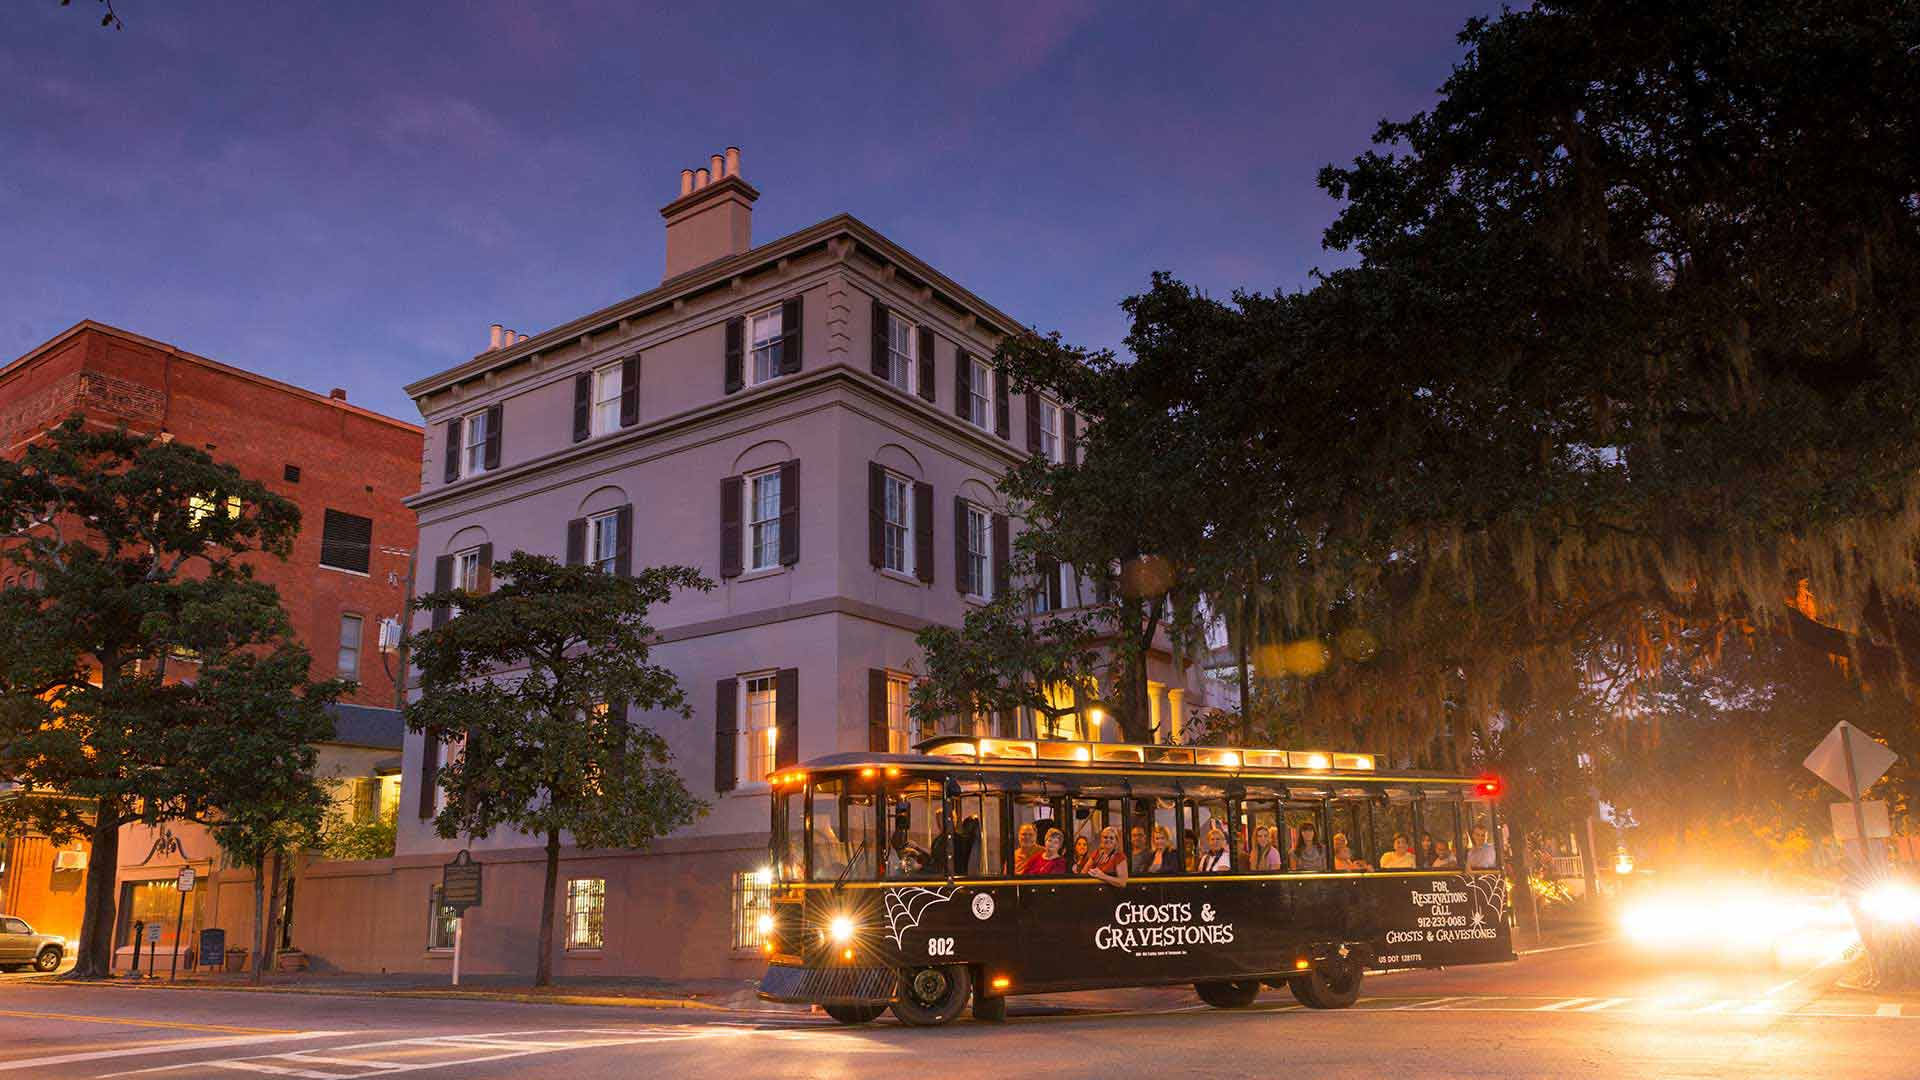 savannah ghost tour trolley at juliette gordon low house